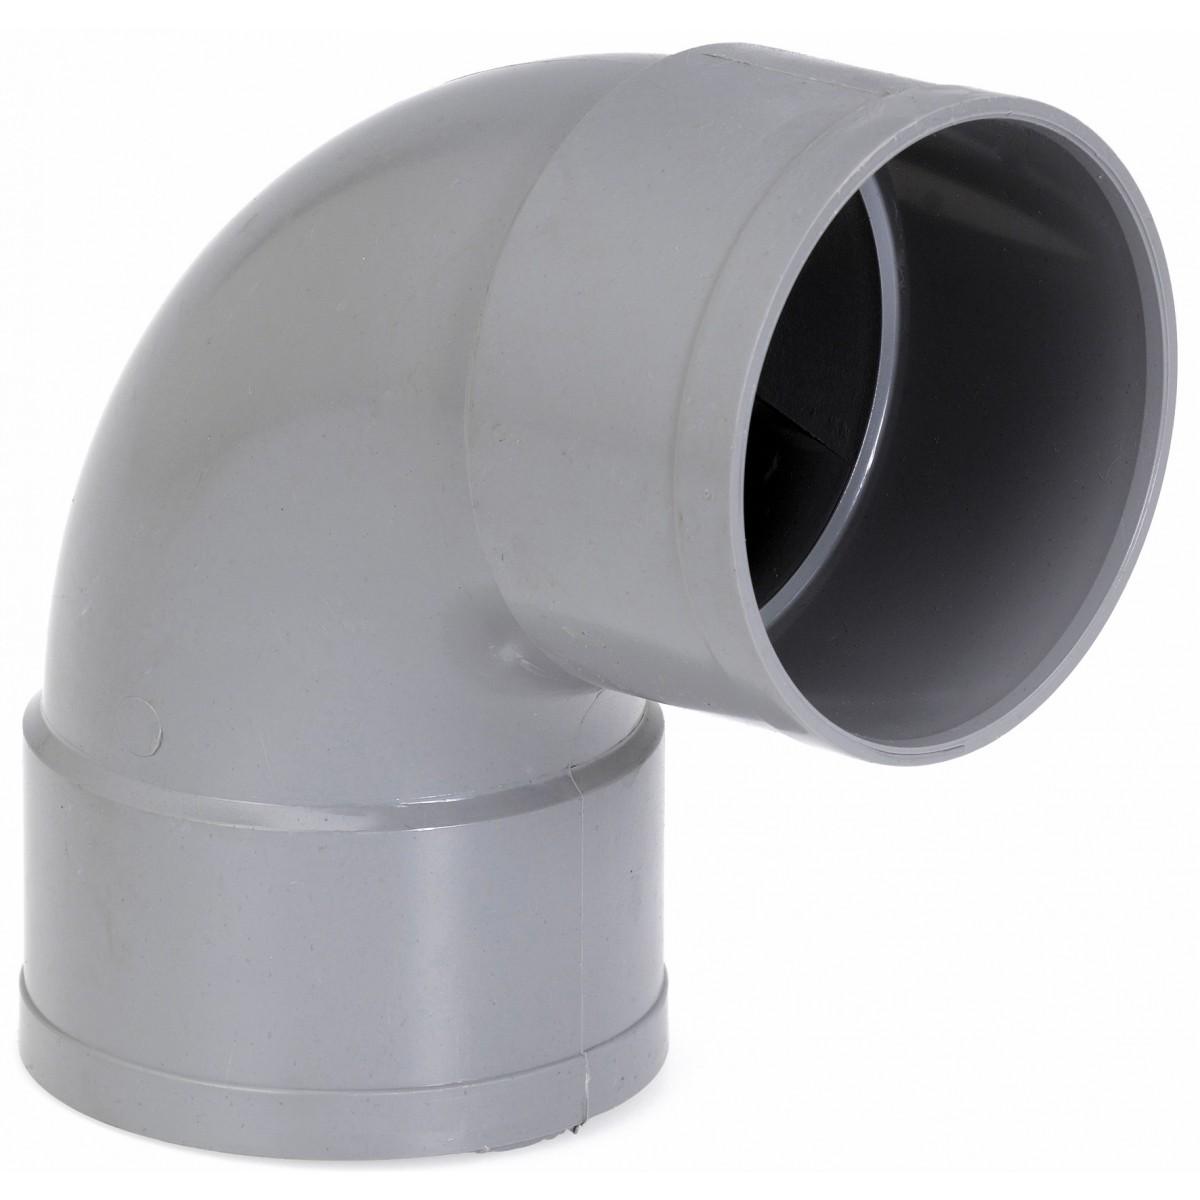 Coude à 87°30 Femelle / Femelle Girpi - Diamètre 32 mm